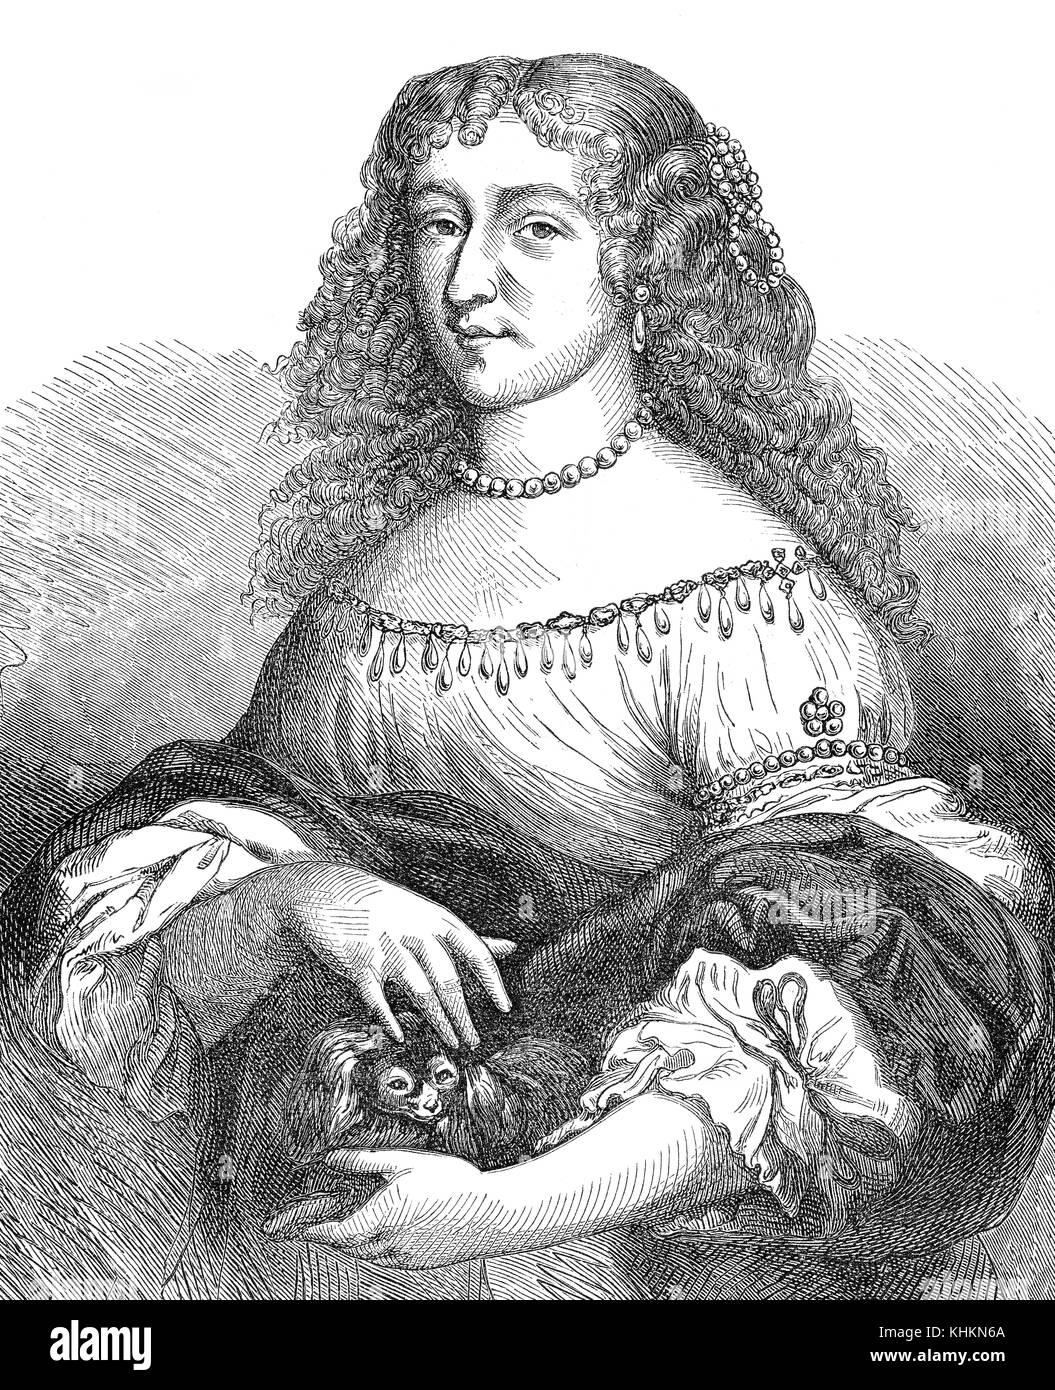 Christina or Kristina of Sweden, 1626 - 1689, Queen of Sweden - Stock Image